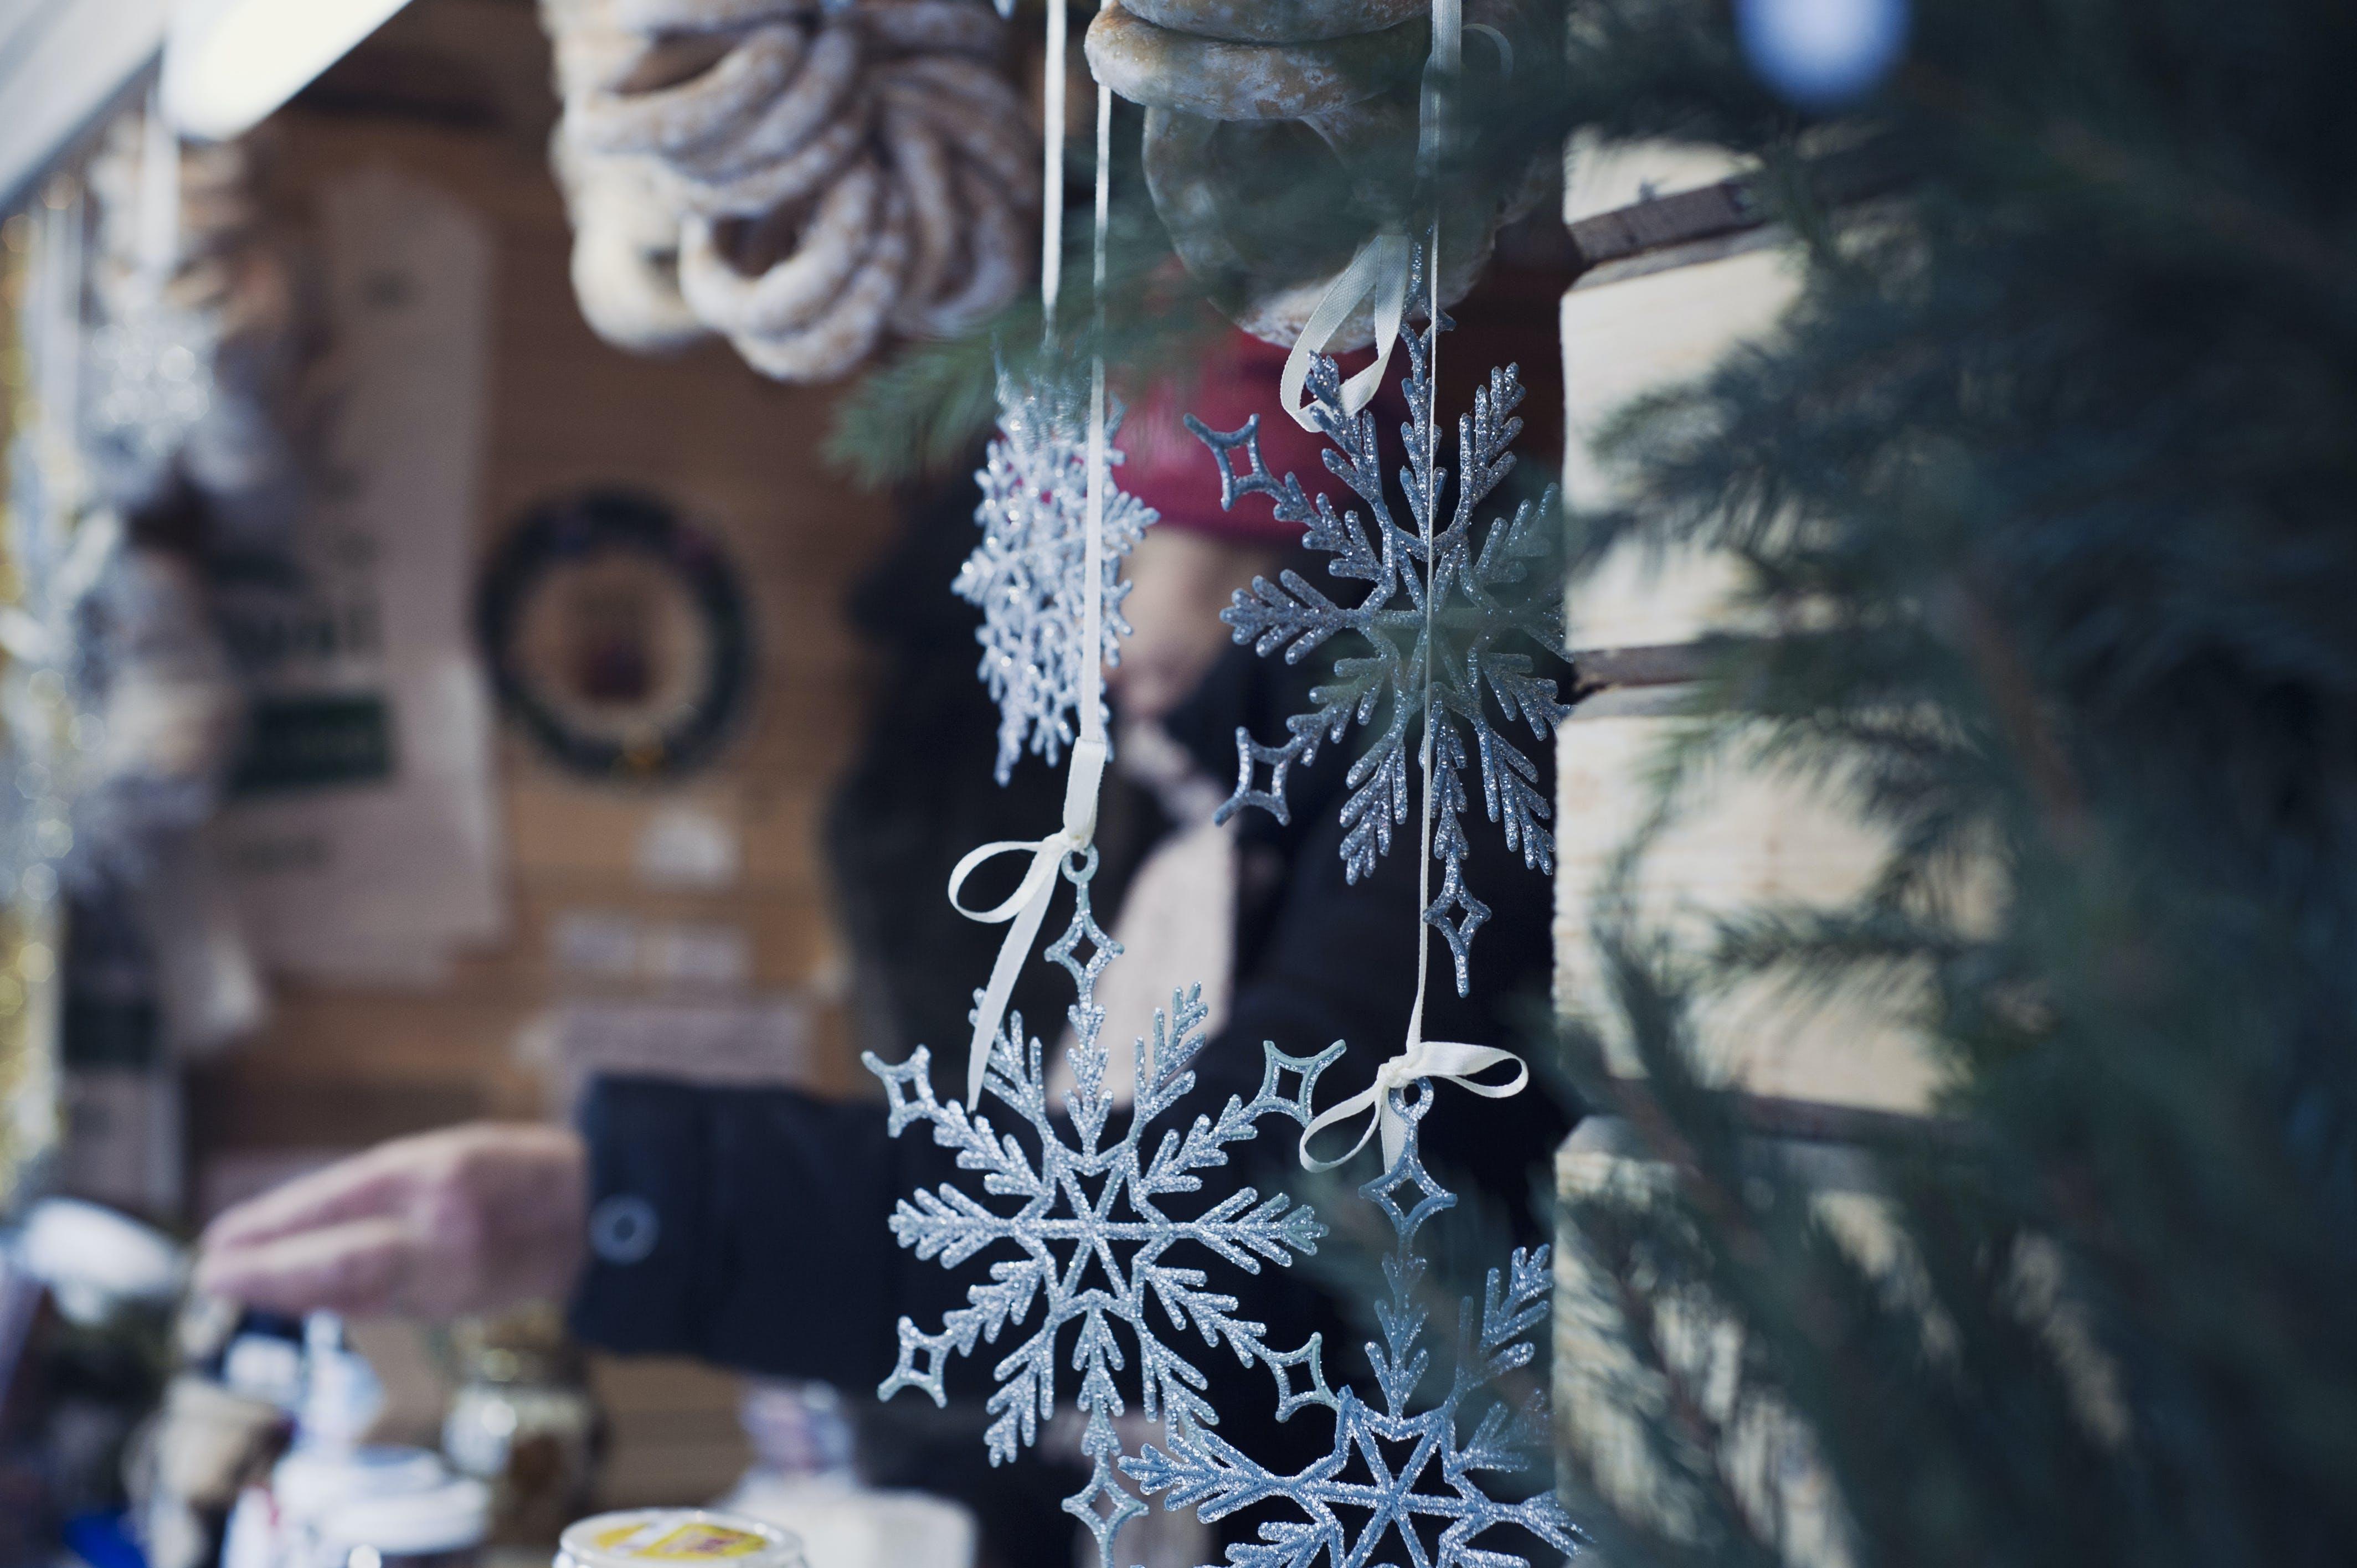 Shallow Focus Photography of Snowflakes Christmas Tree Decor